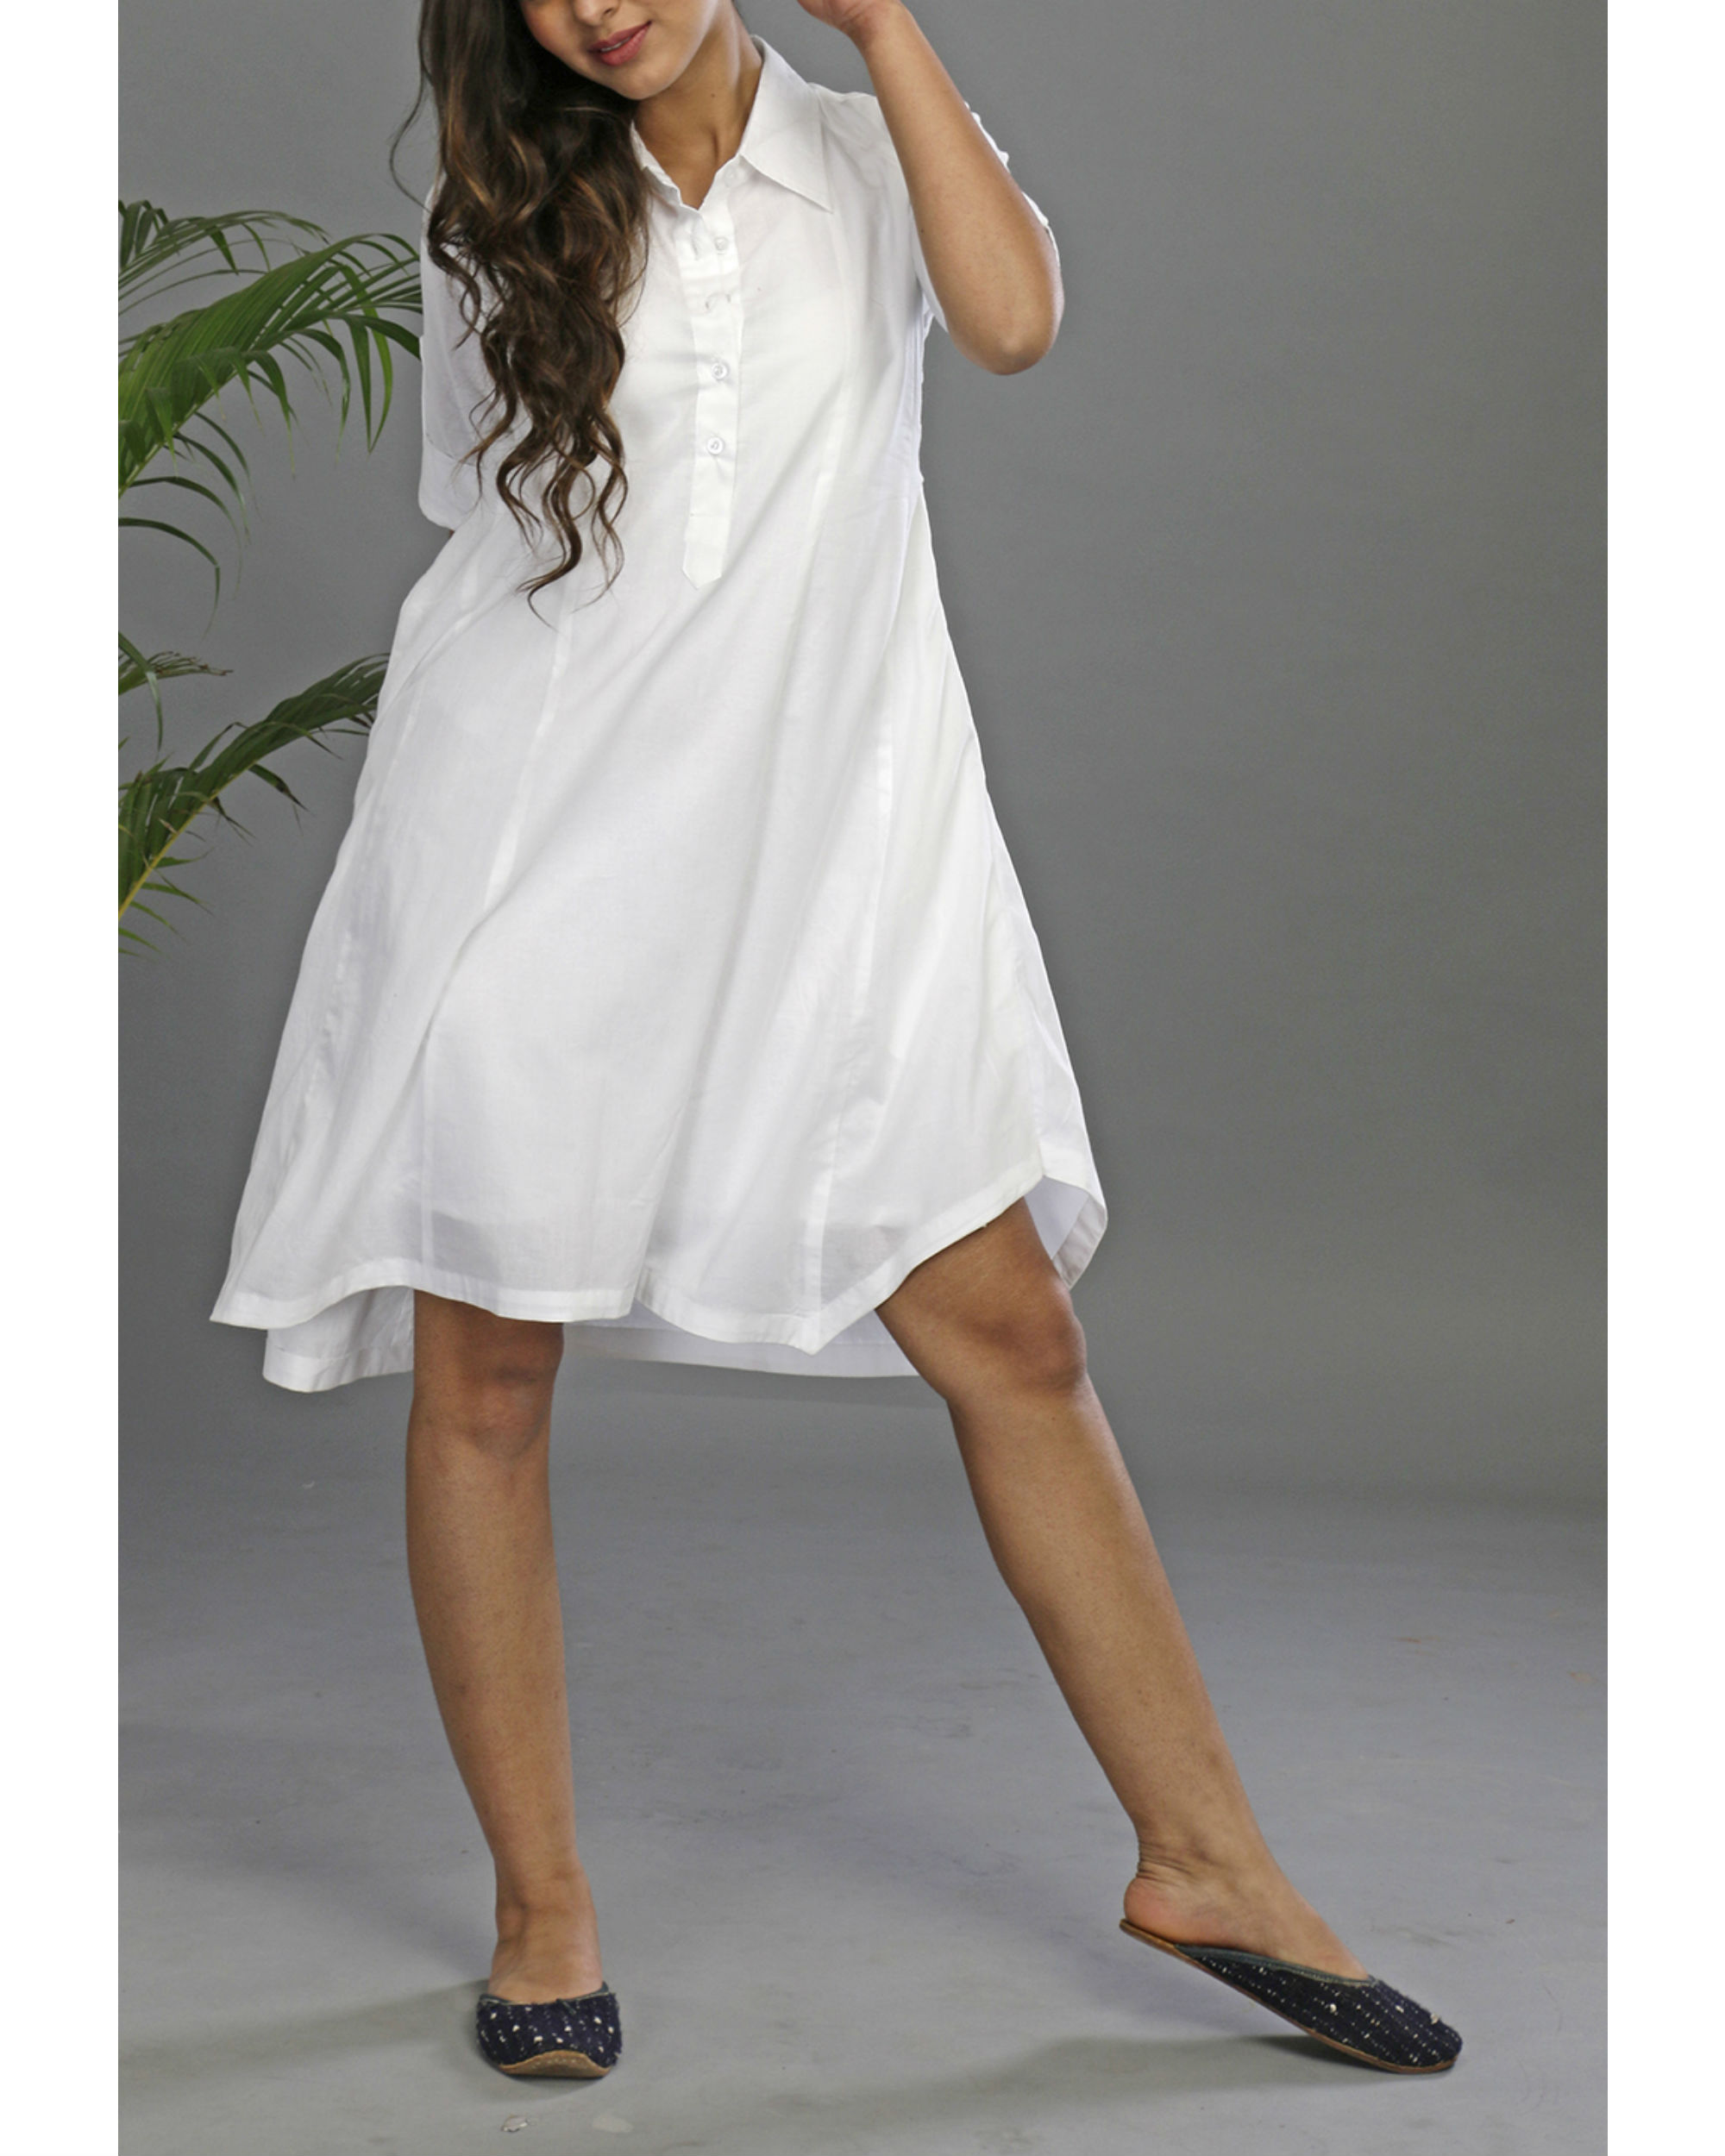 Serene asymmetrical dress